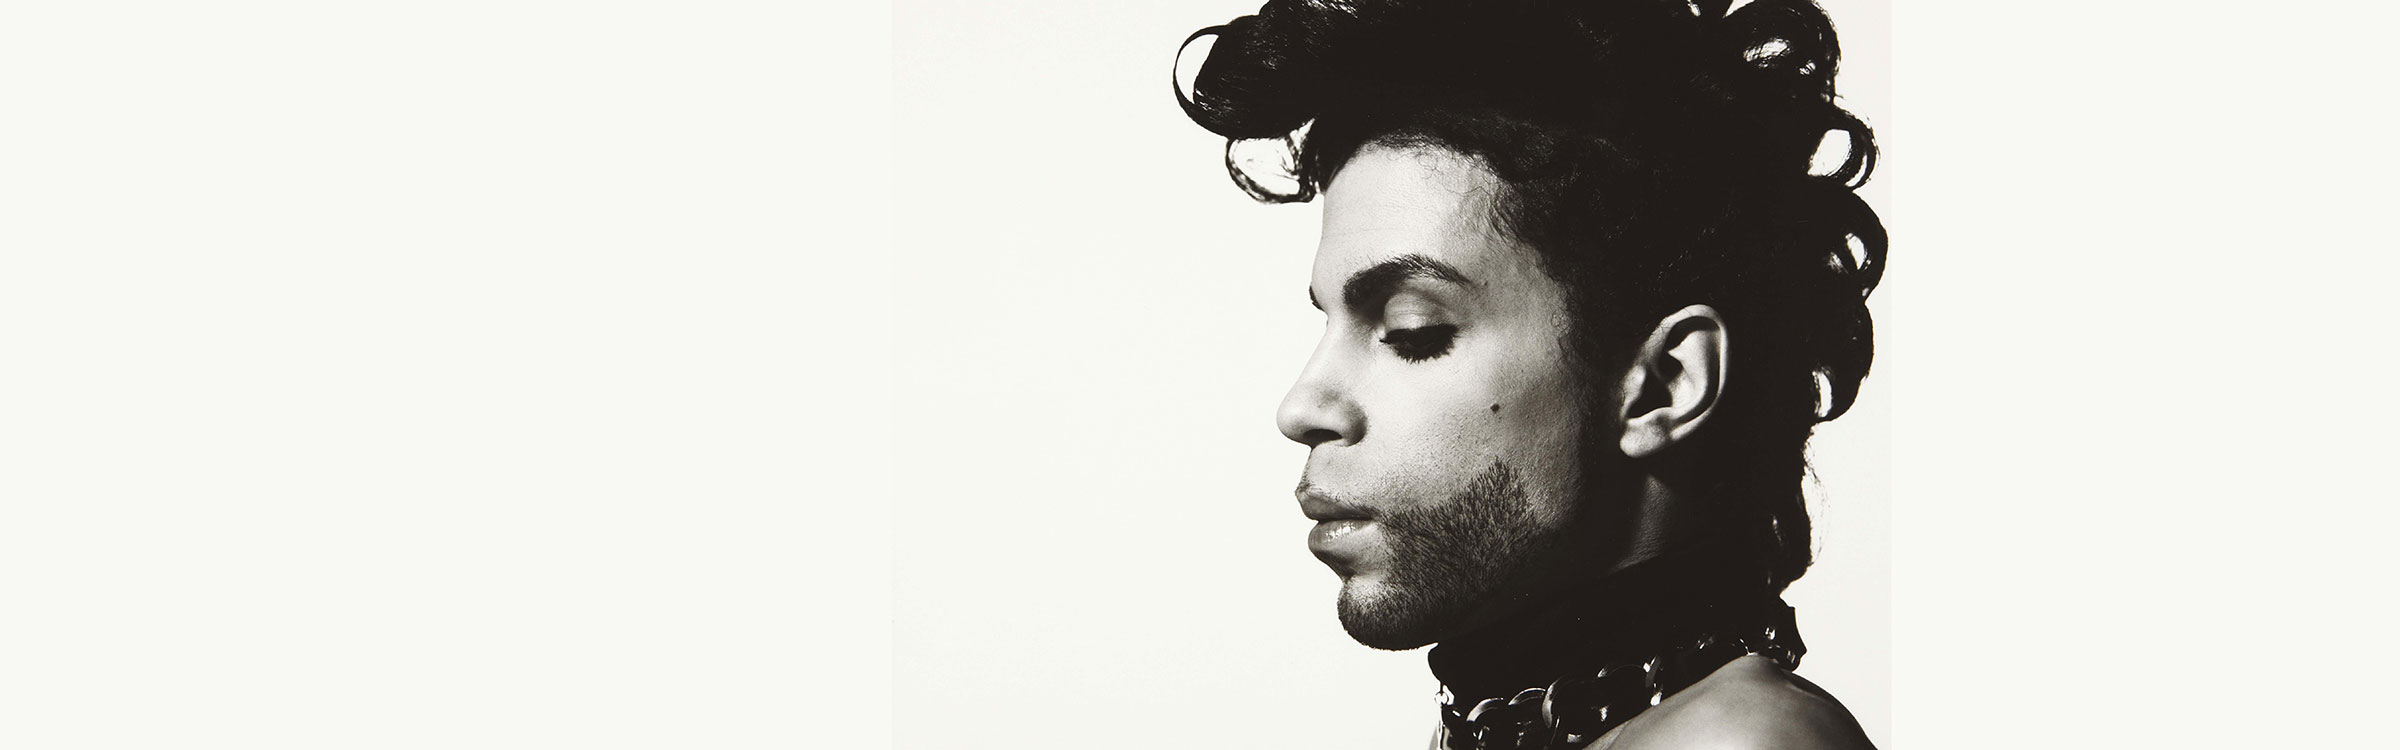 Prince page